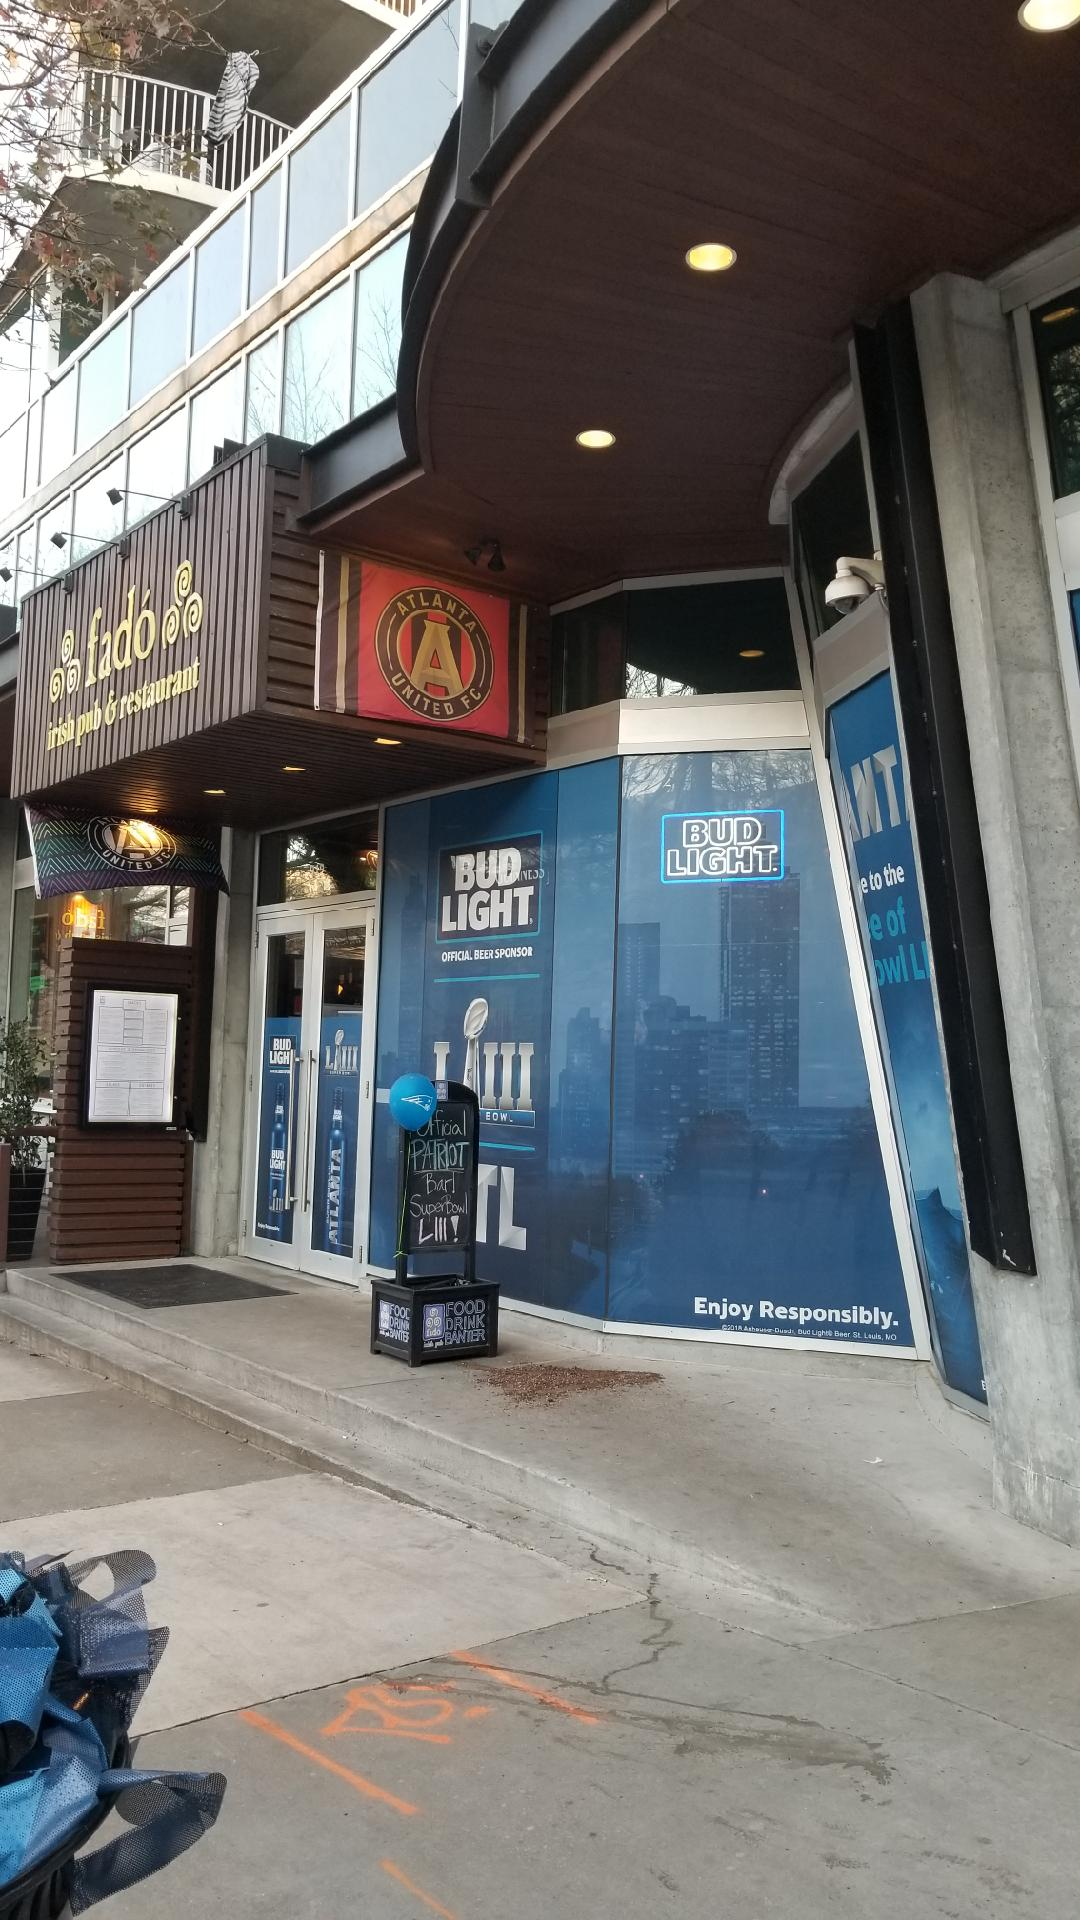 Anheuser-Busch-Super-Bowl-LIII_Fado-Irish-Pub_Window-Graphics_Events_LSIGraphics_Atlanta-GA_4 ..